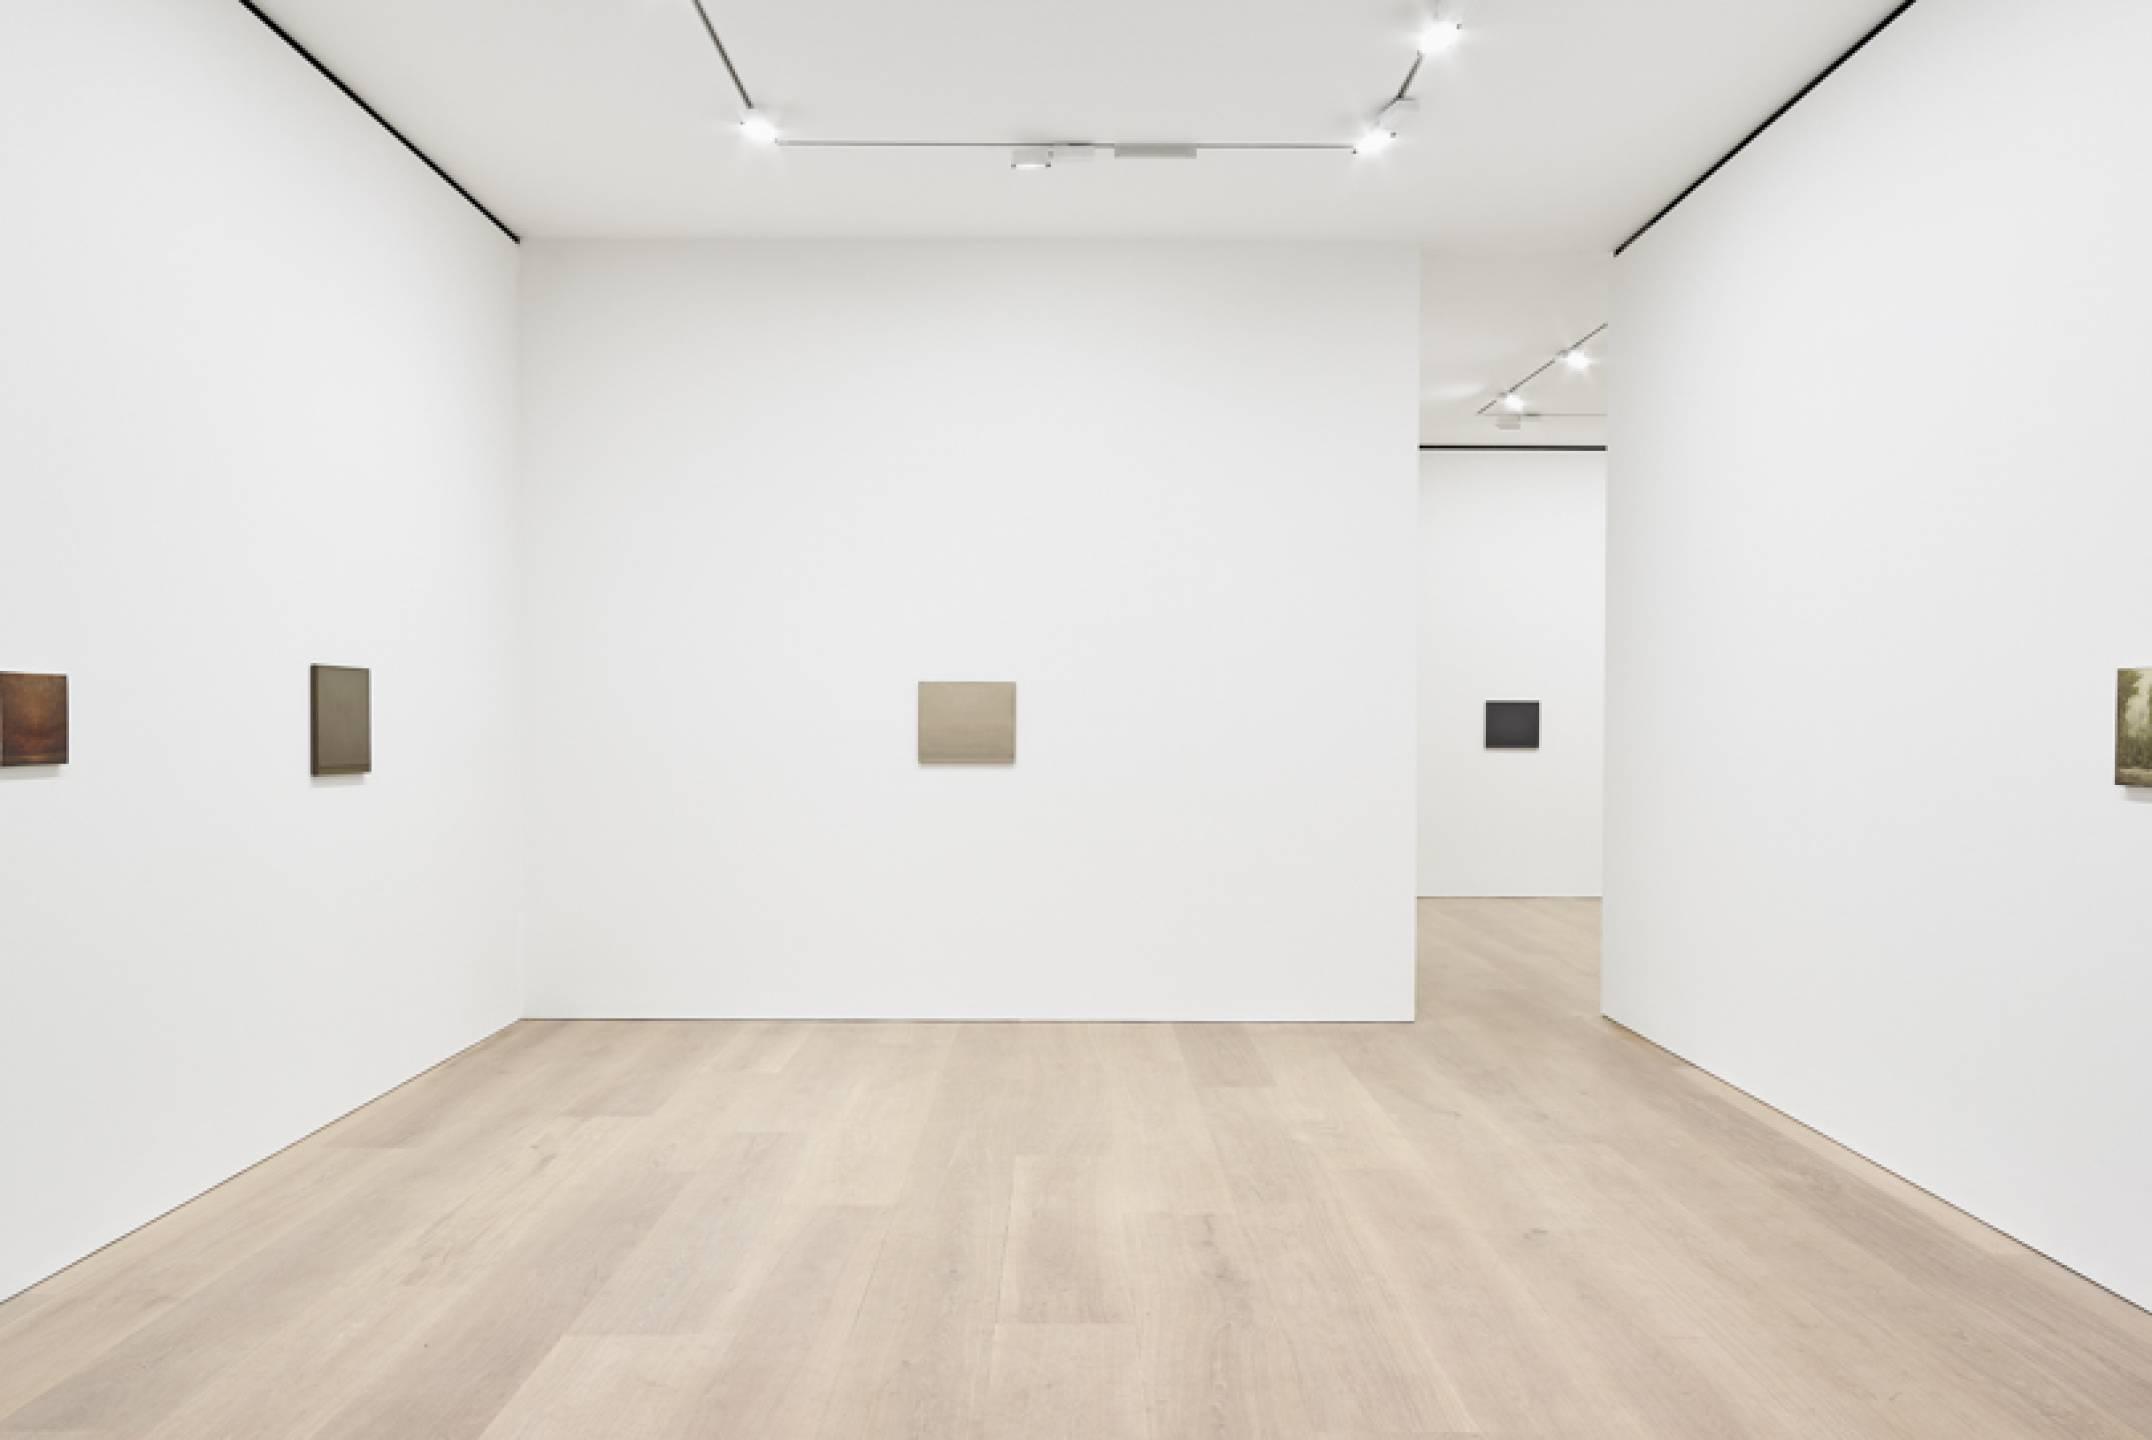 Lucas Arruda,&nbsp;<em>Deserto-Modelo,</em>&nbsp;David Zwirner, London, 2017 - Mendes Wood DM